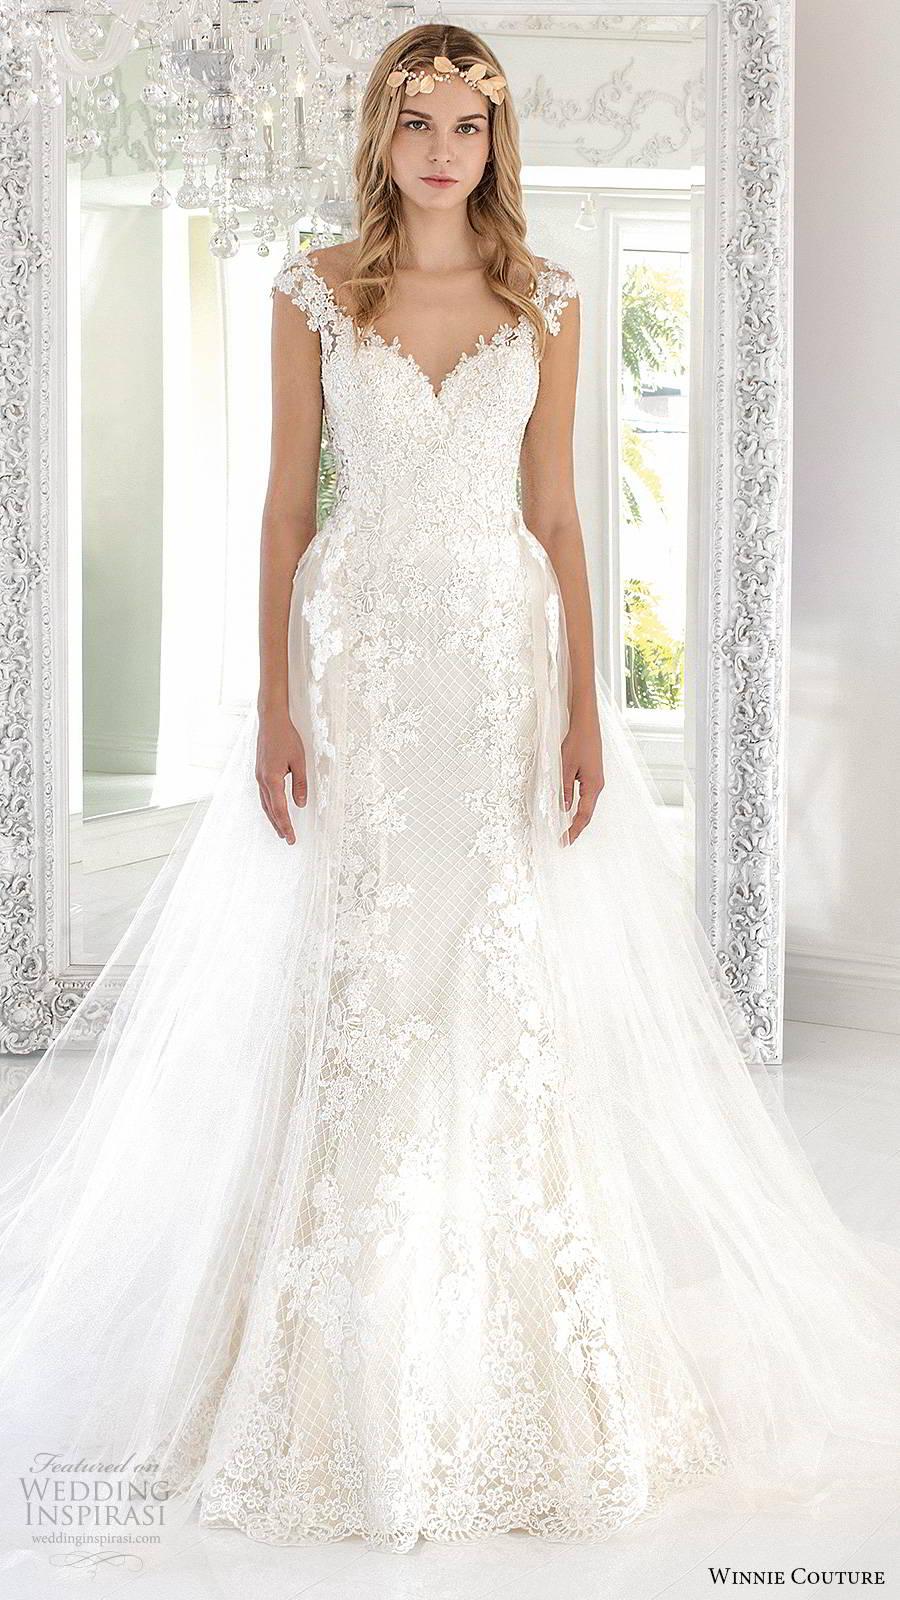 winnie couture 2019 bridal cap sleeves sweetheart neckline fully embellished lace sheath wedding dress a line overskirt chapel train (8) mv